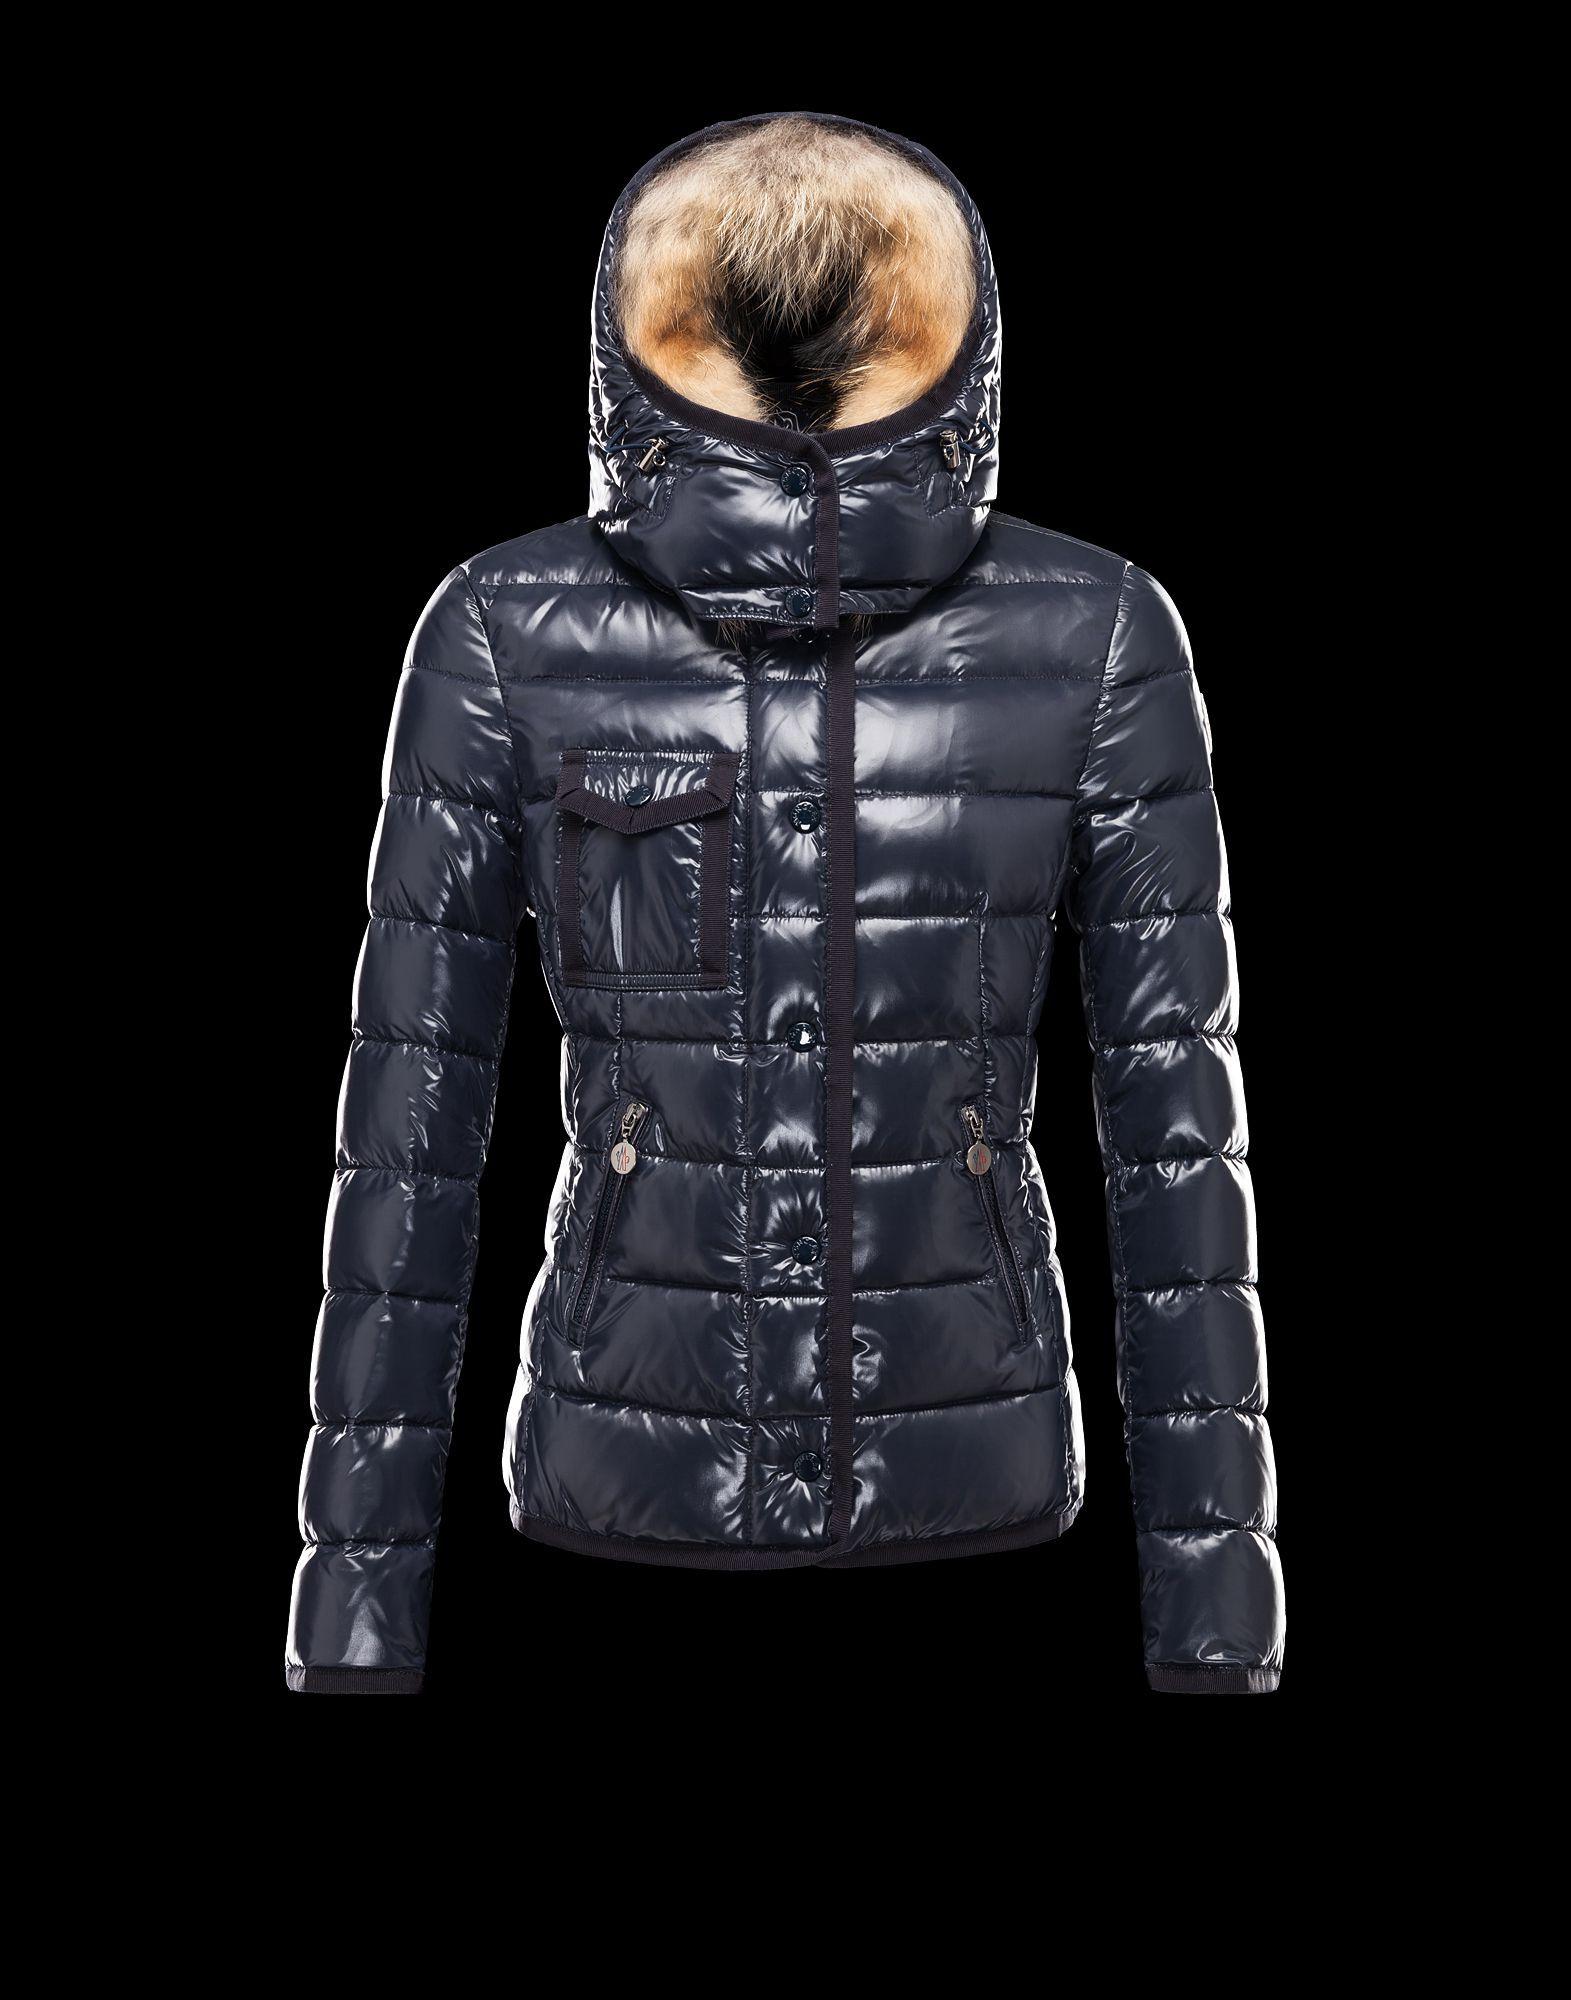 moncler jacket original